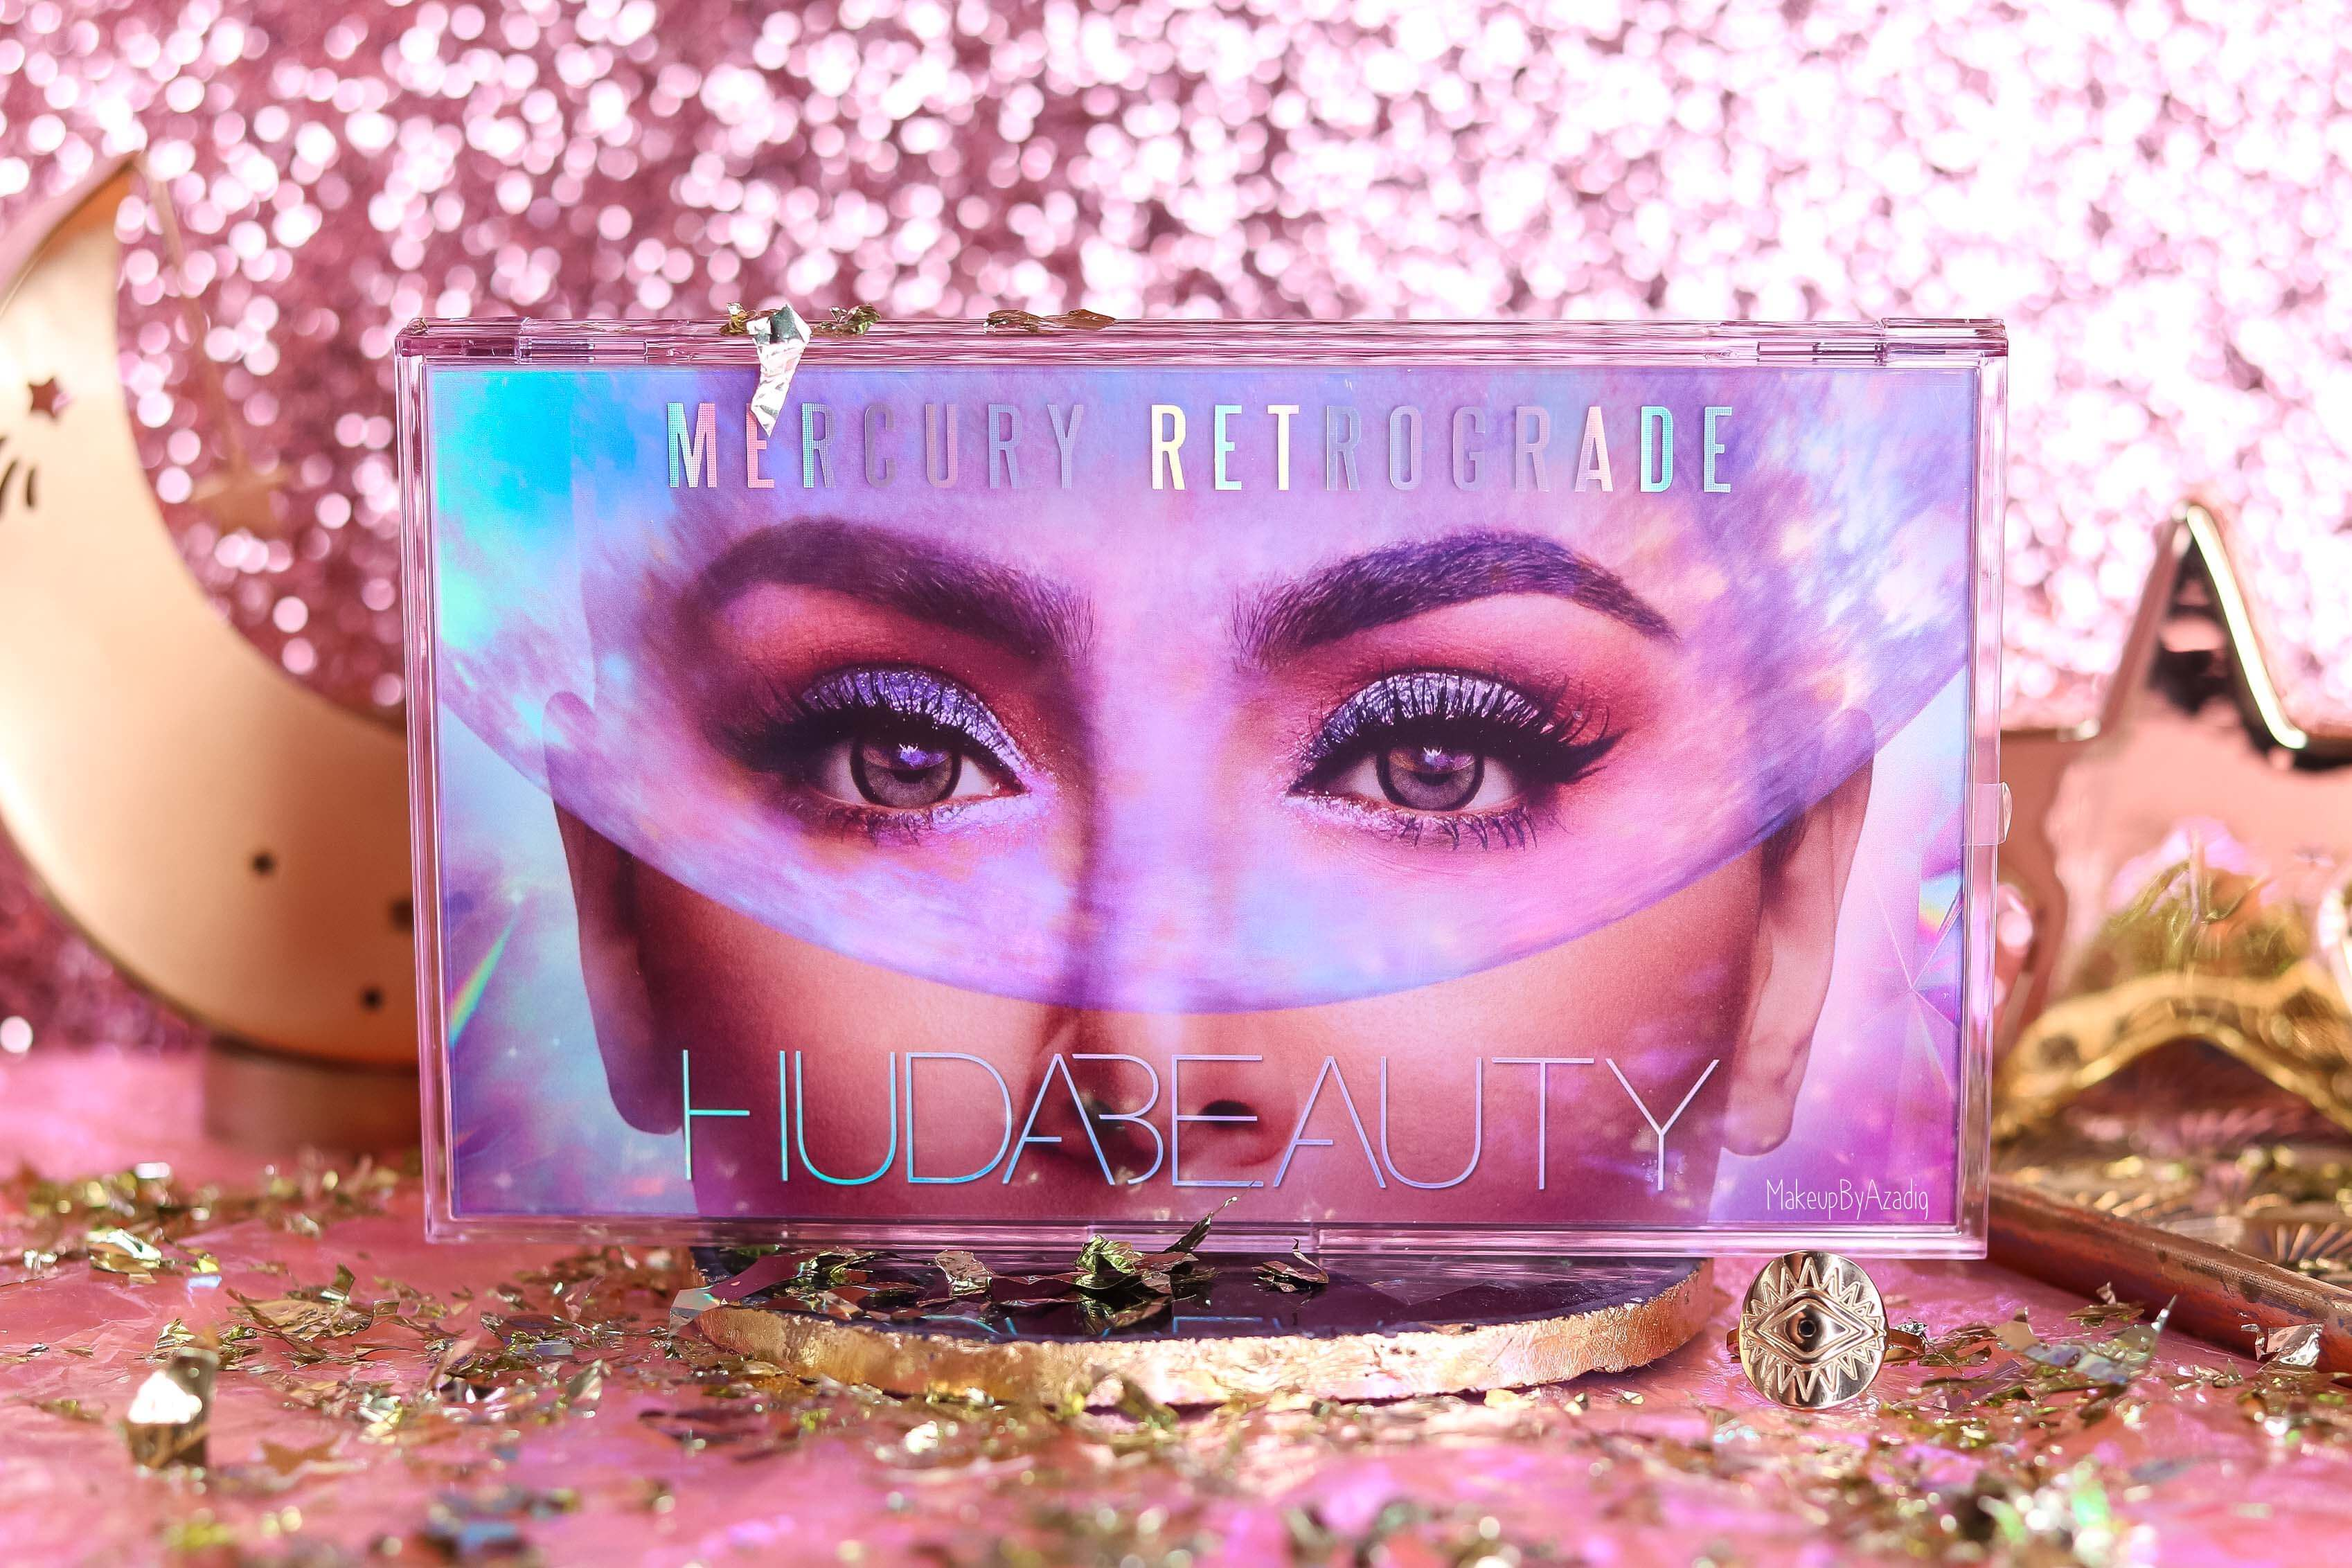 revue-palette-mercury-retrograde-huda-beauty-sephora-france-makeupbyazadig-avis-prix-swatch-astrologie-packaging